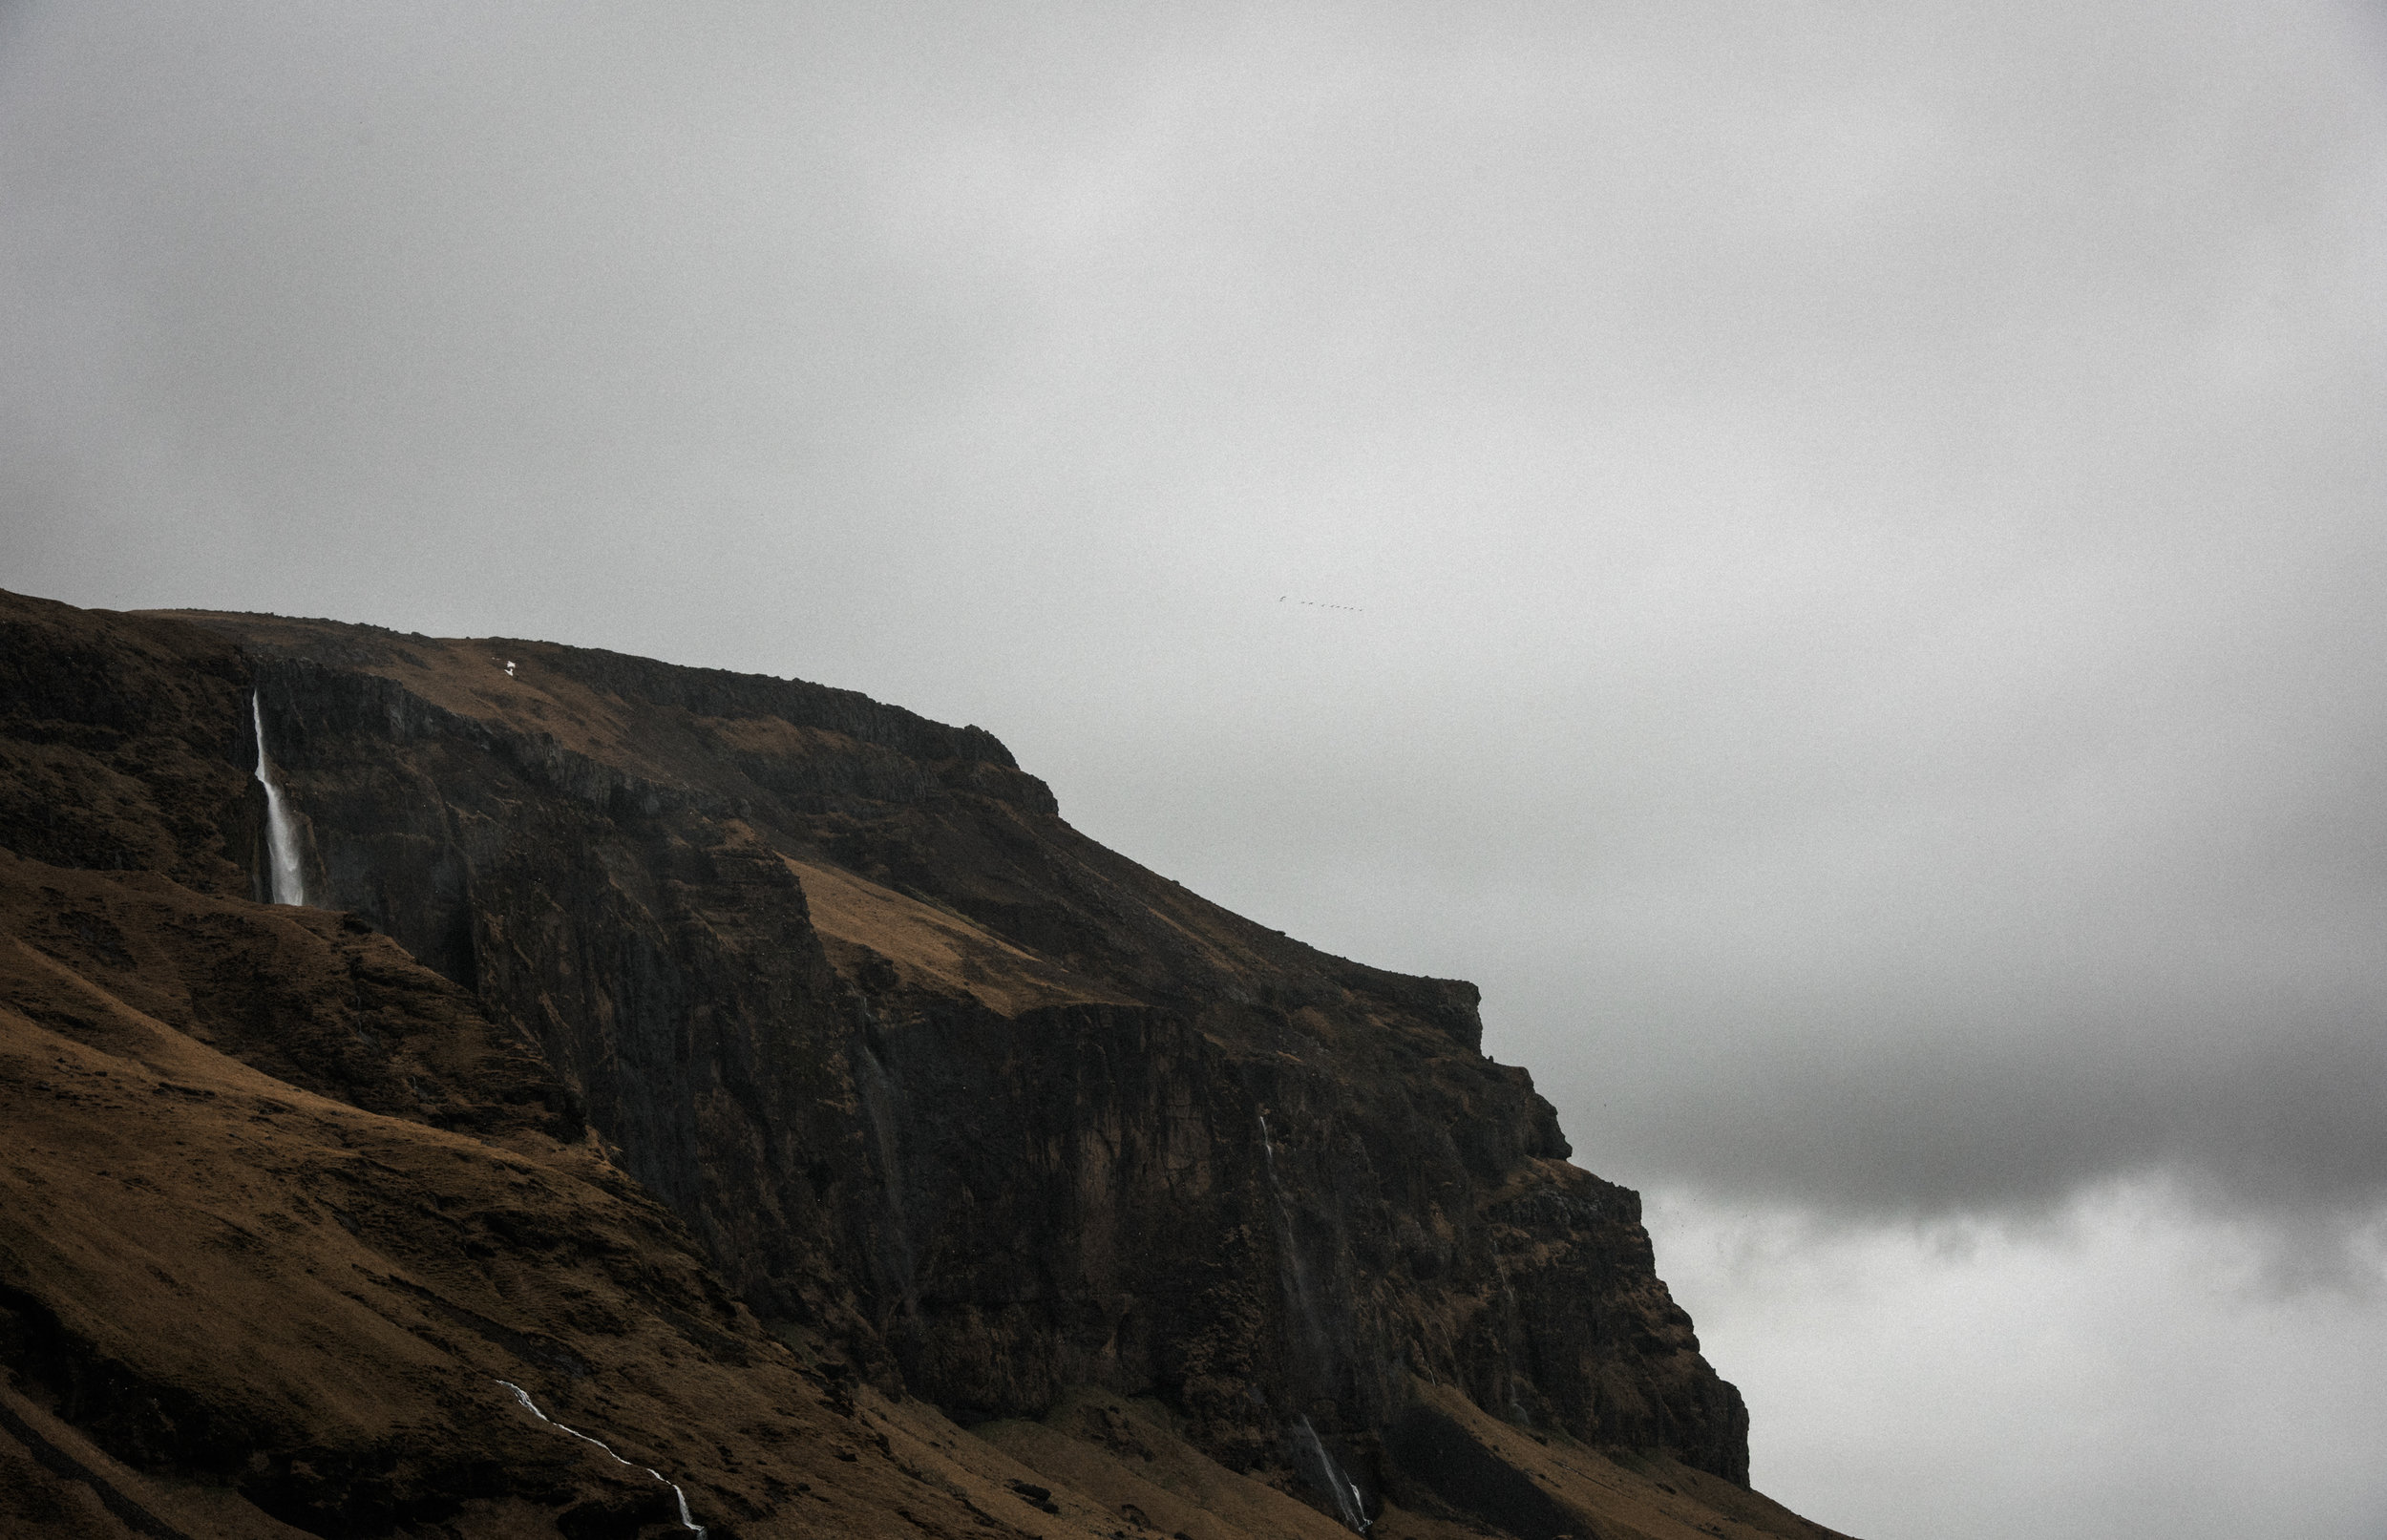 ICELAND_WOMAN_PHOTOGRAPHER_TARASHUPE_OUTDOOR_PHOTOGRAPHY_009.jpg